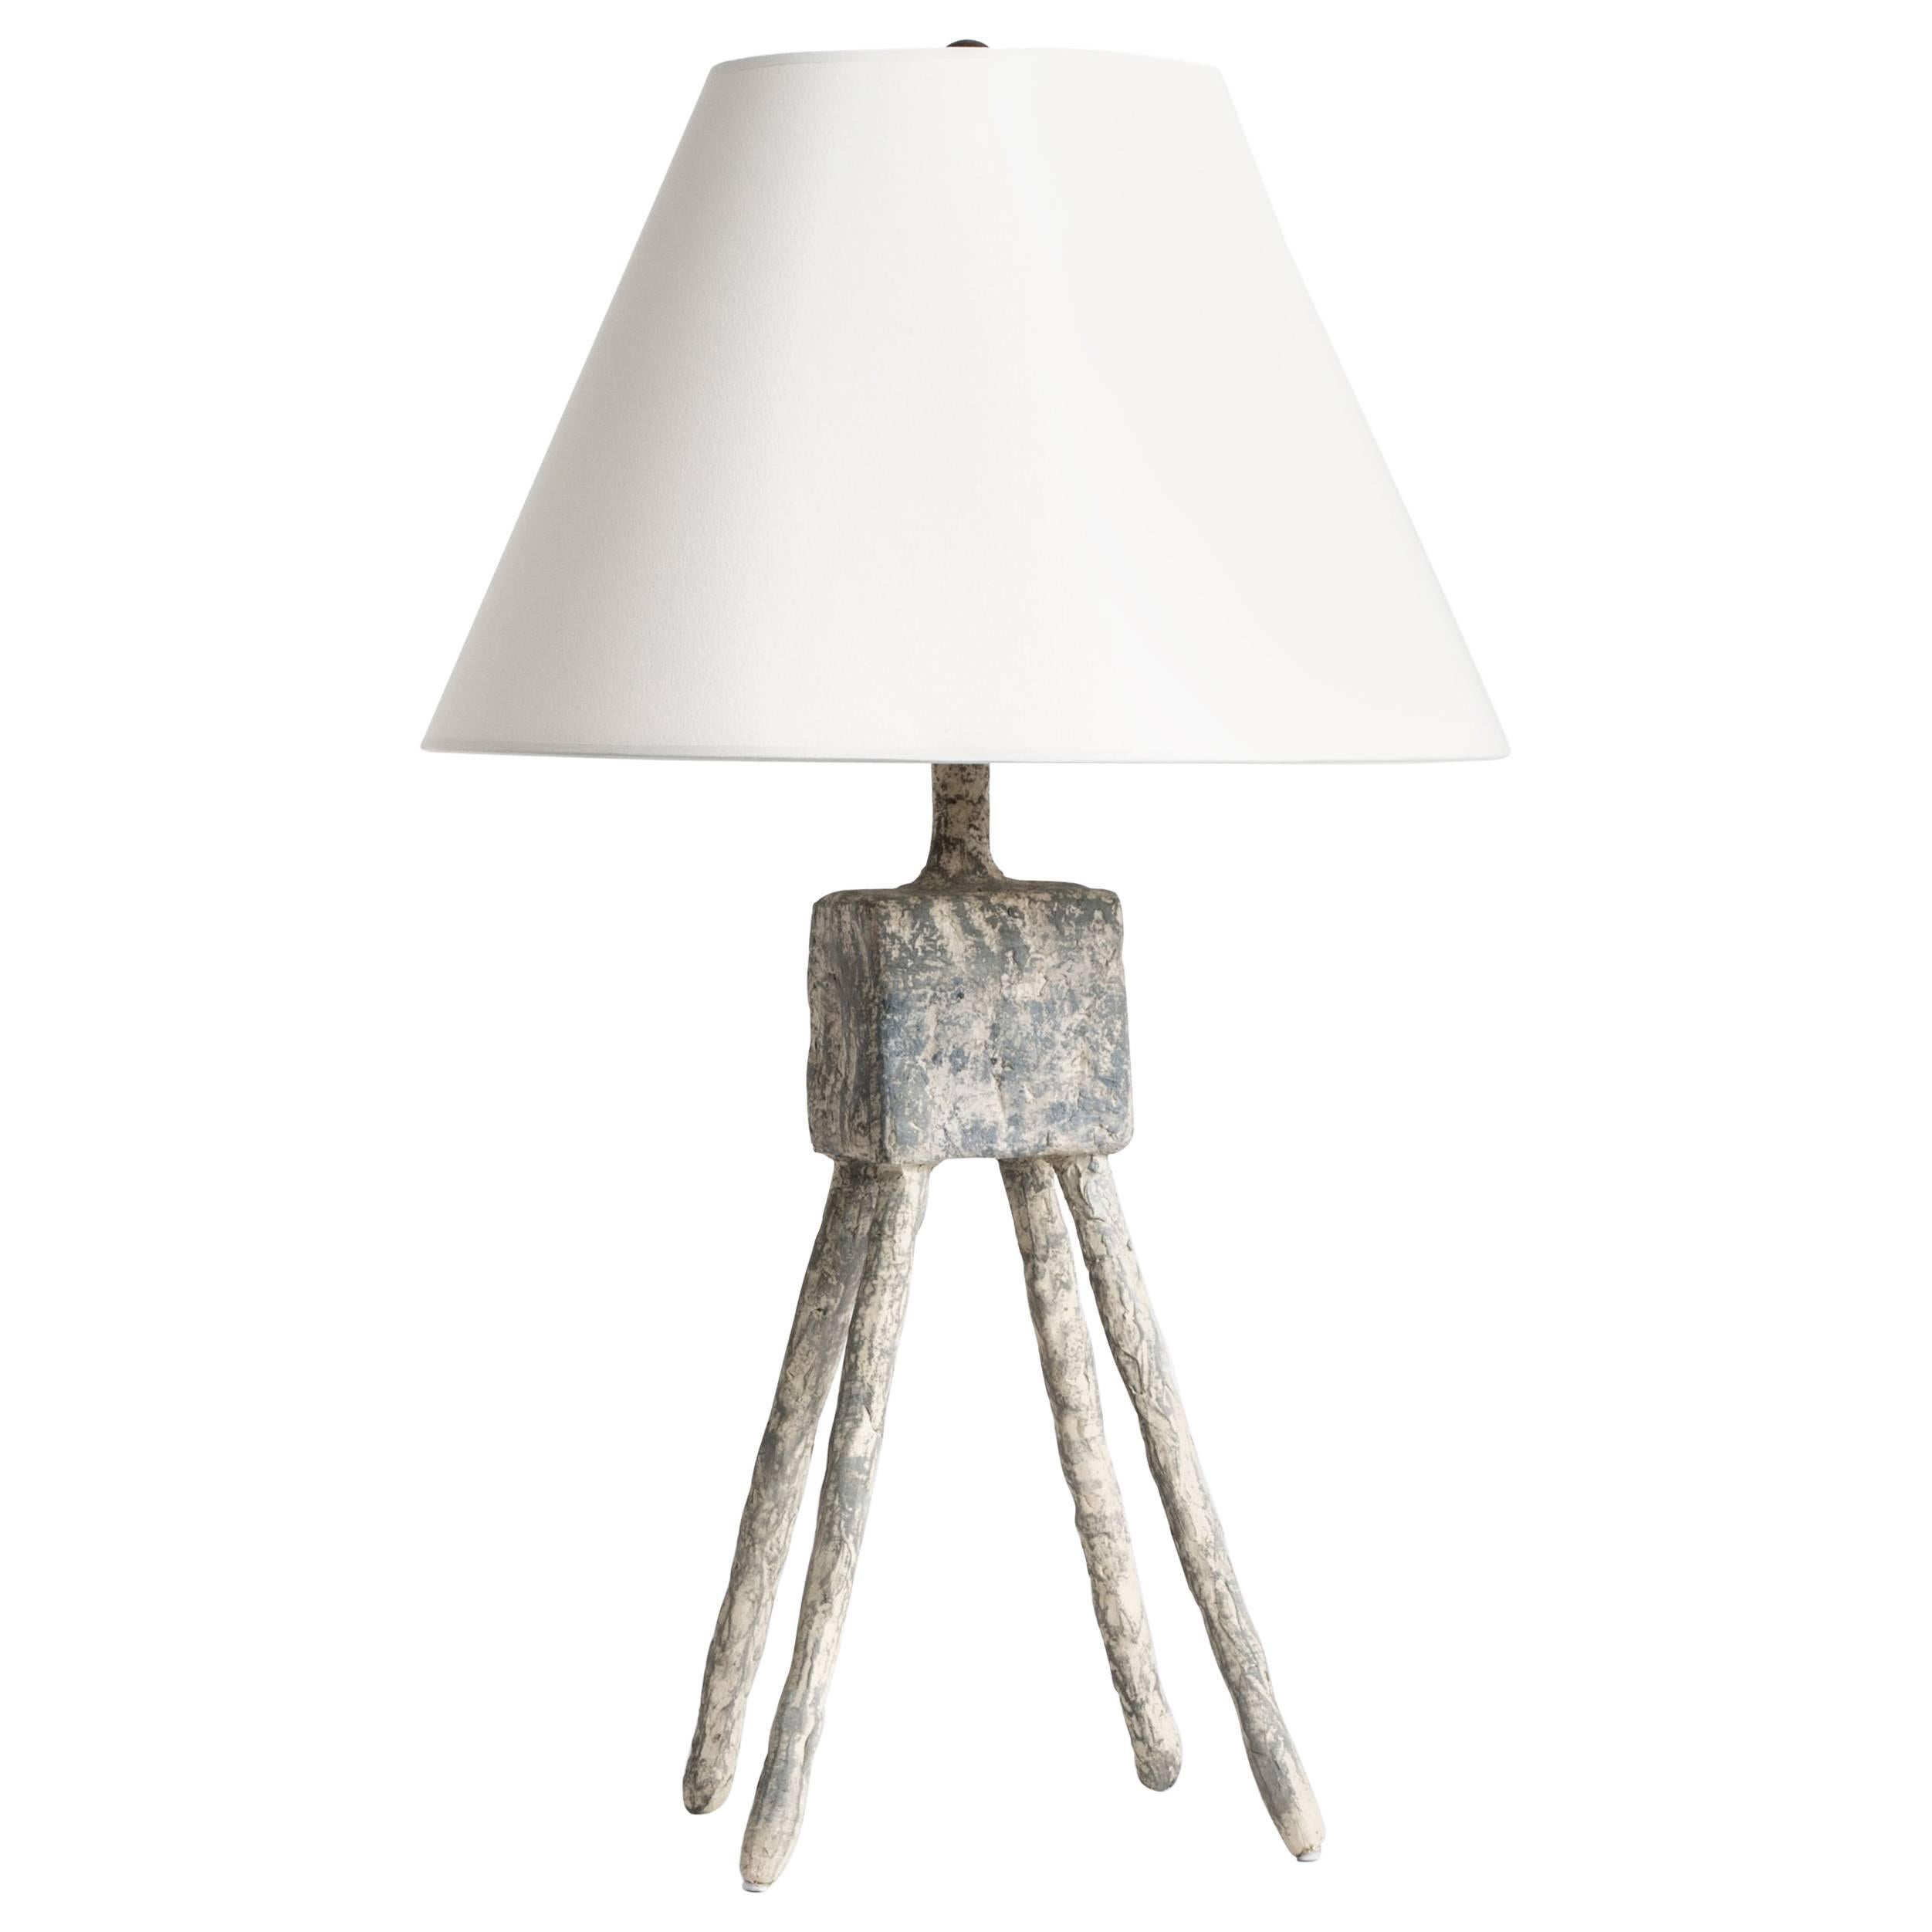 Cast Resin Plaster Texture Morceau Table Lamp, Kacper Dolatowski